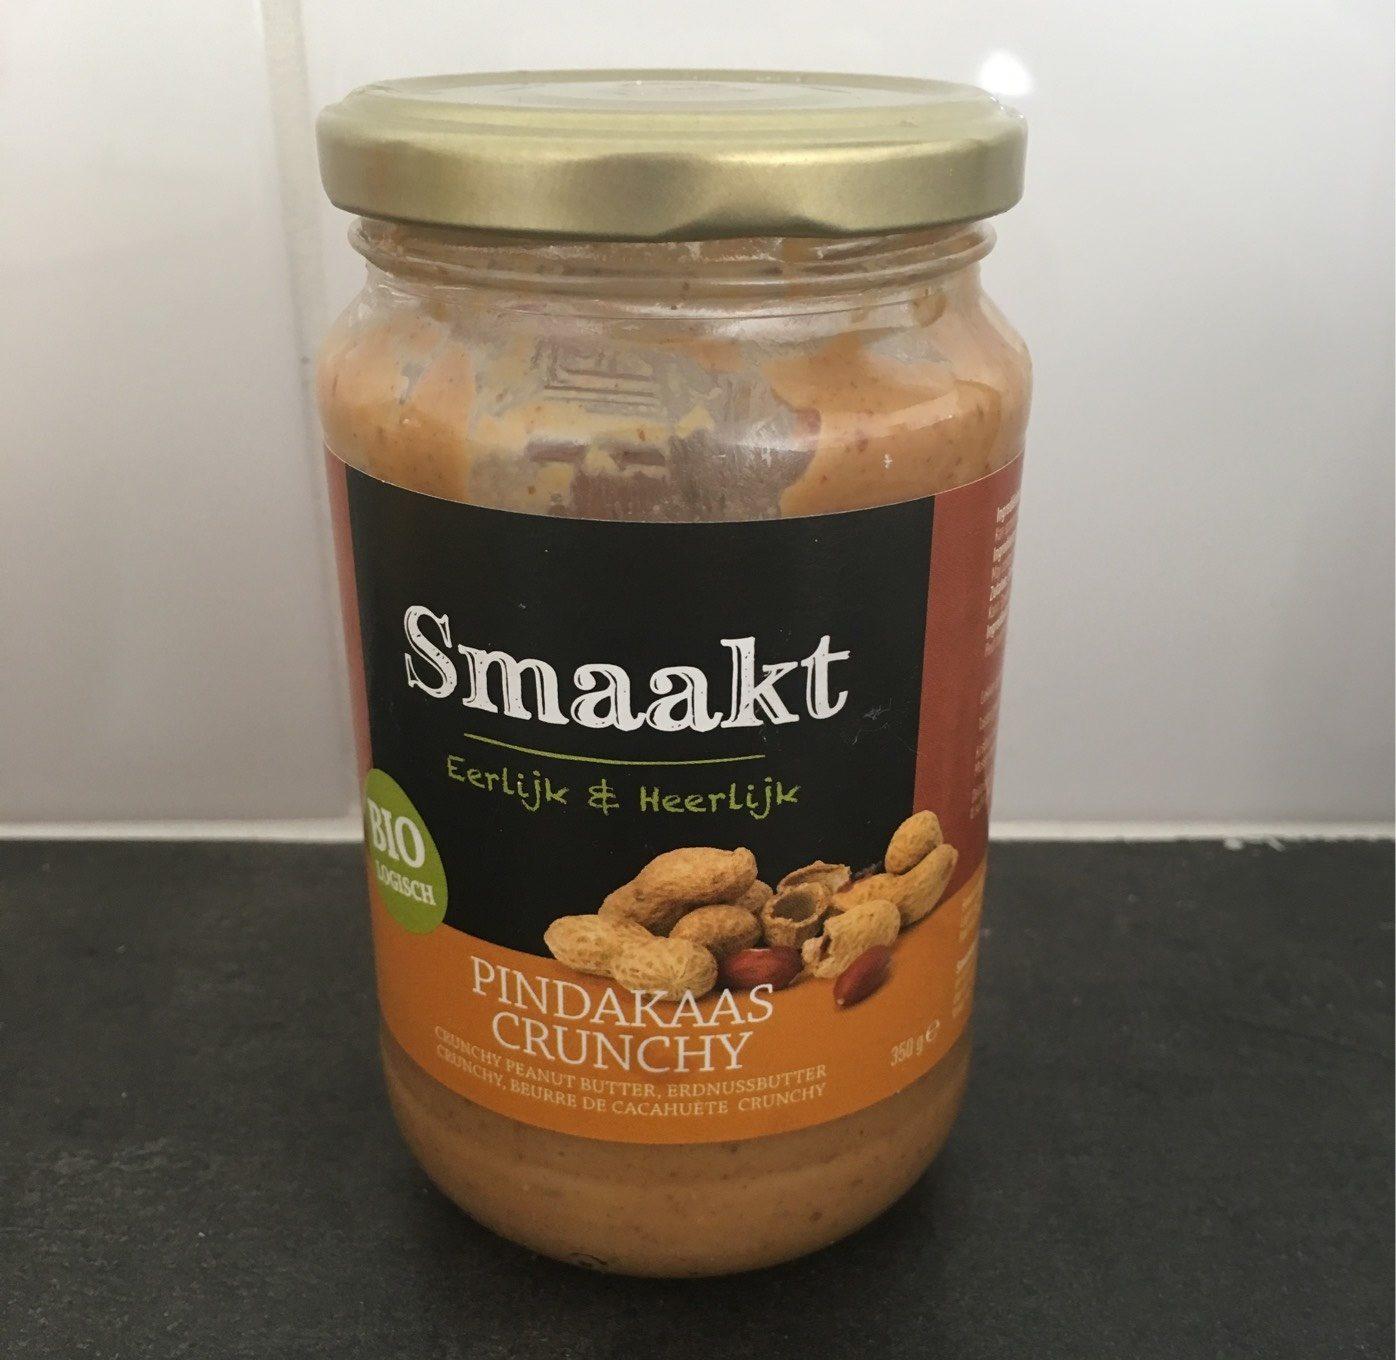 Pindakaas Crunchy - Produit - fr